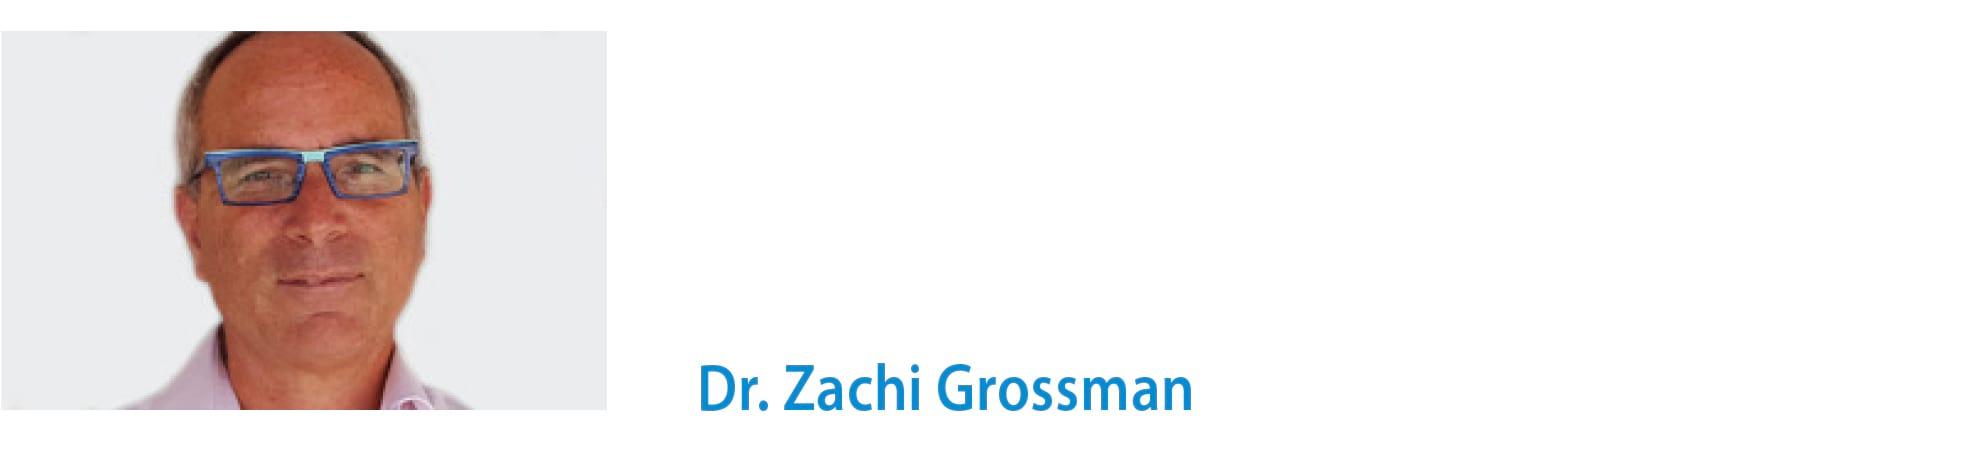 zachi